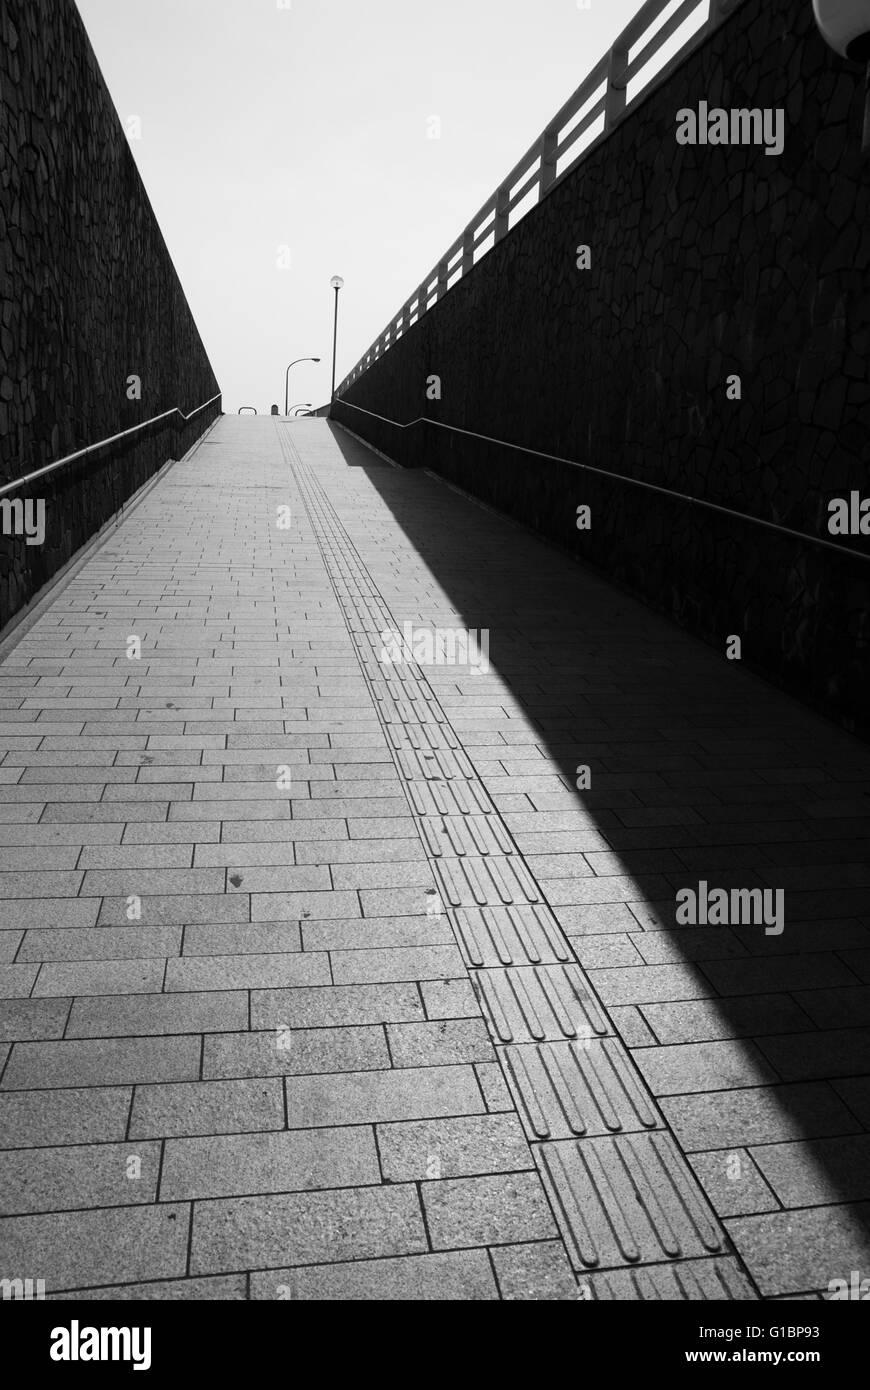 Enoshima pedestrian walkway - Stock Image